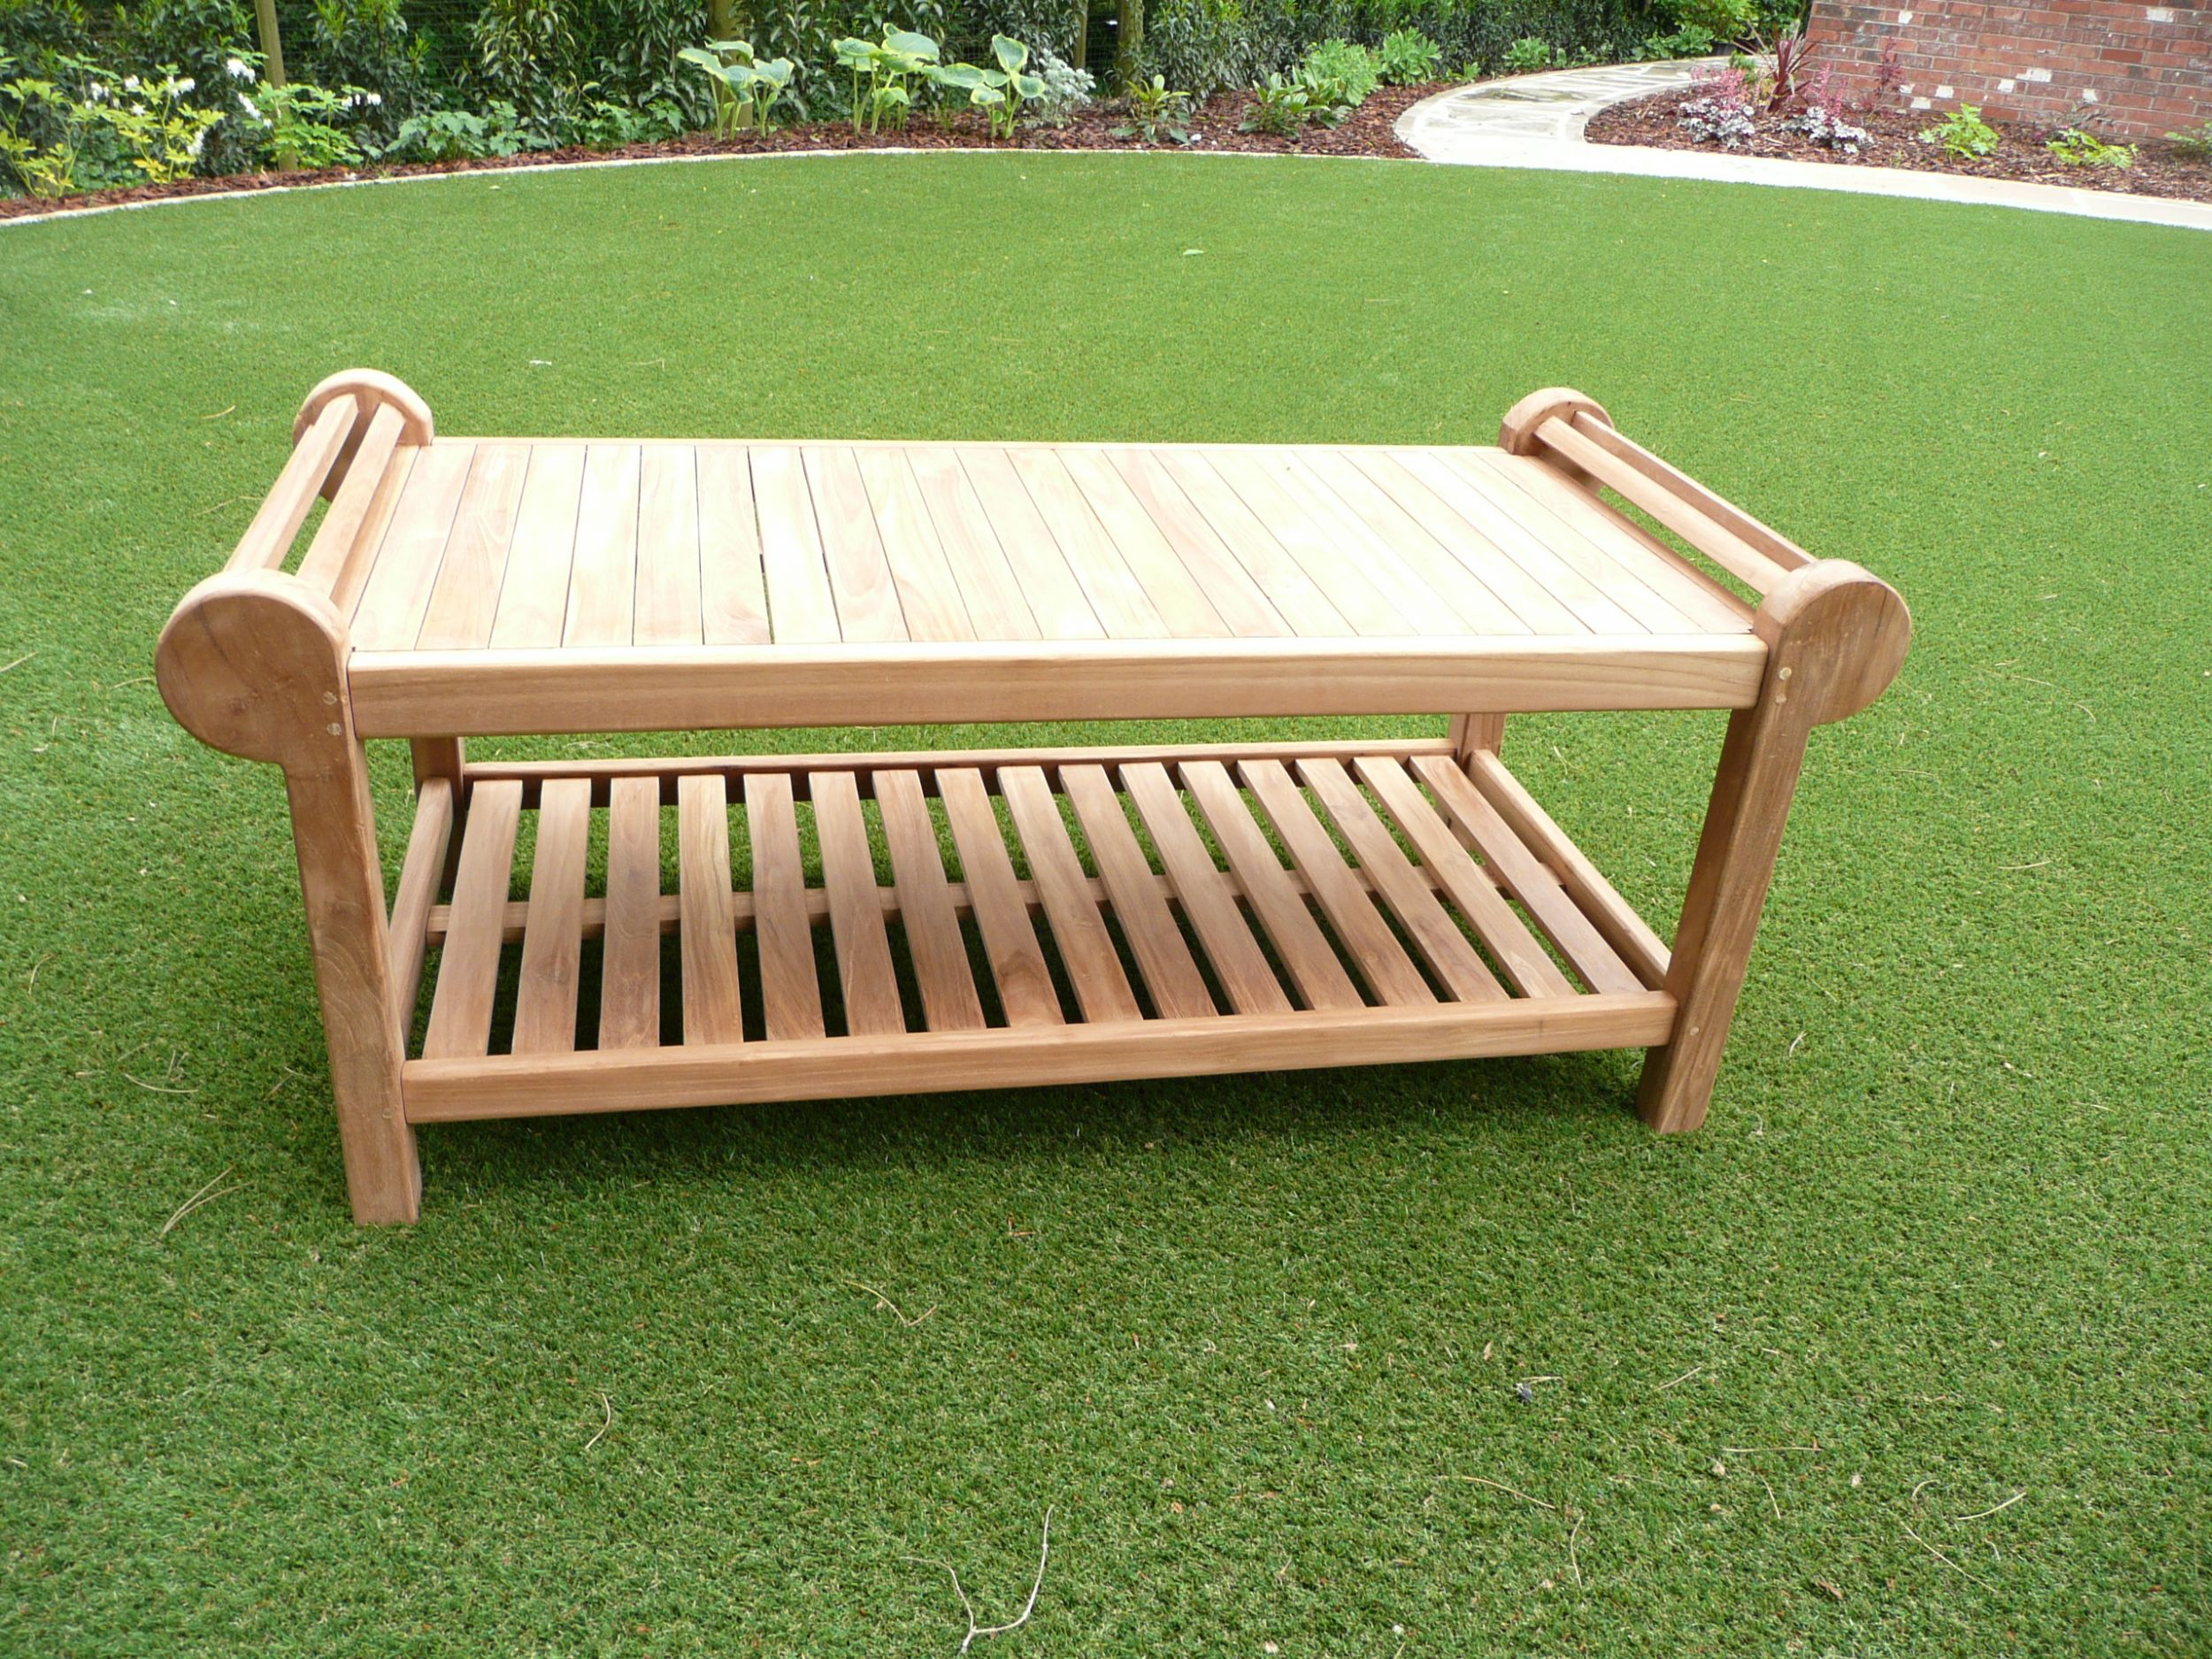 Lutyens 3 Seater Teak Garden Coffee Table | Humber Imports